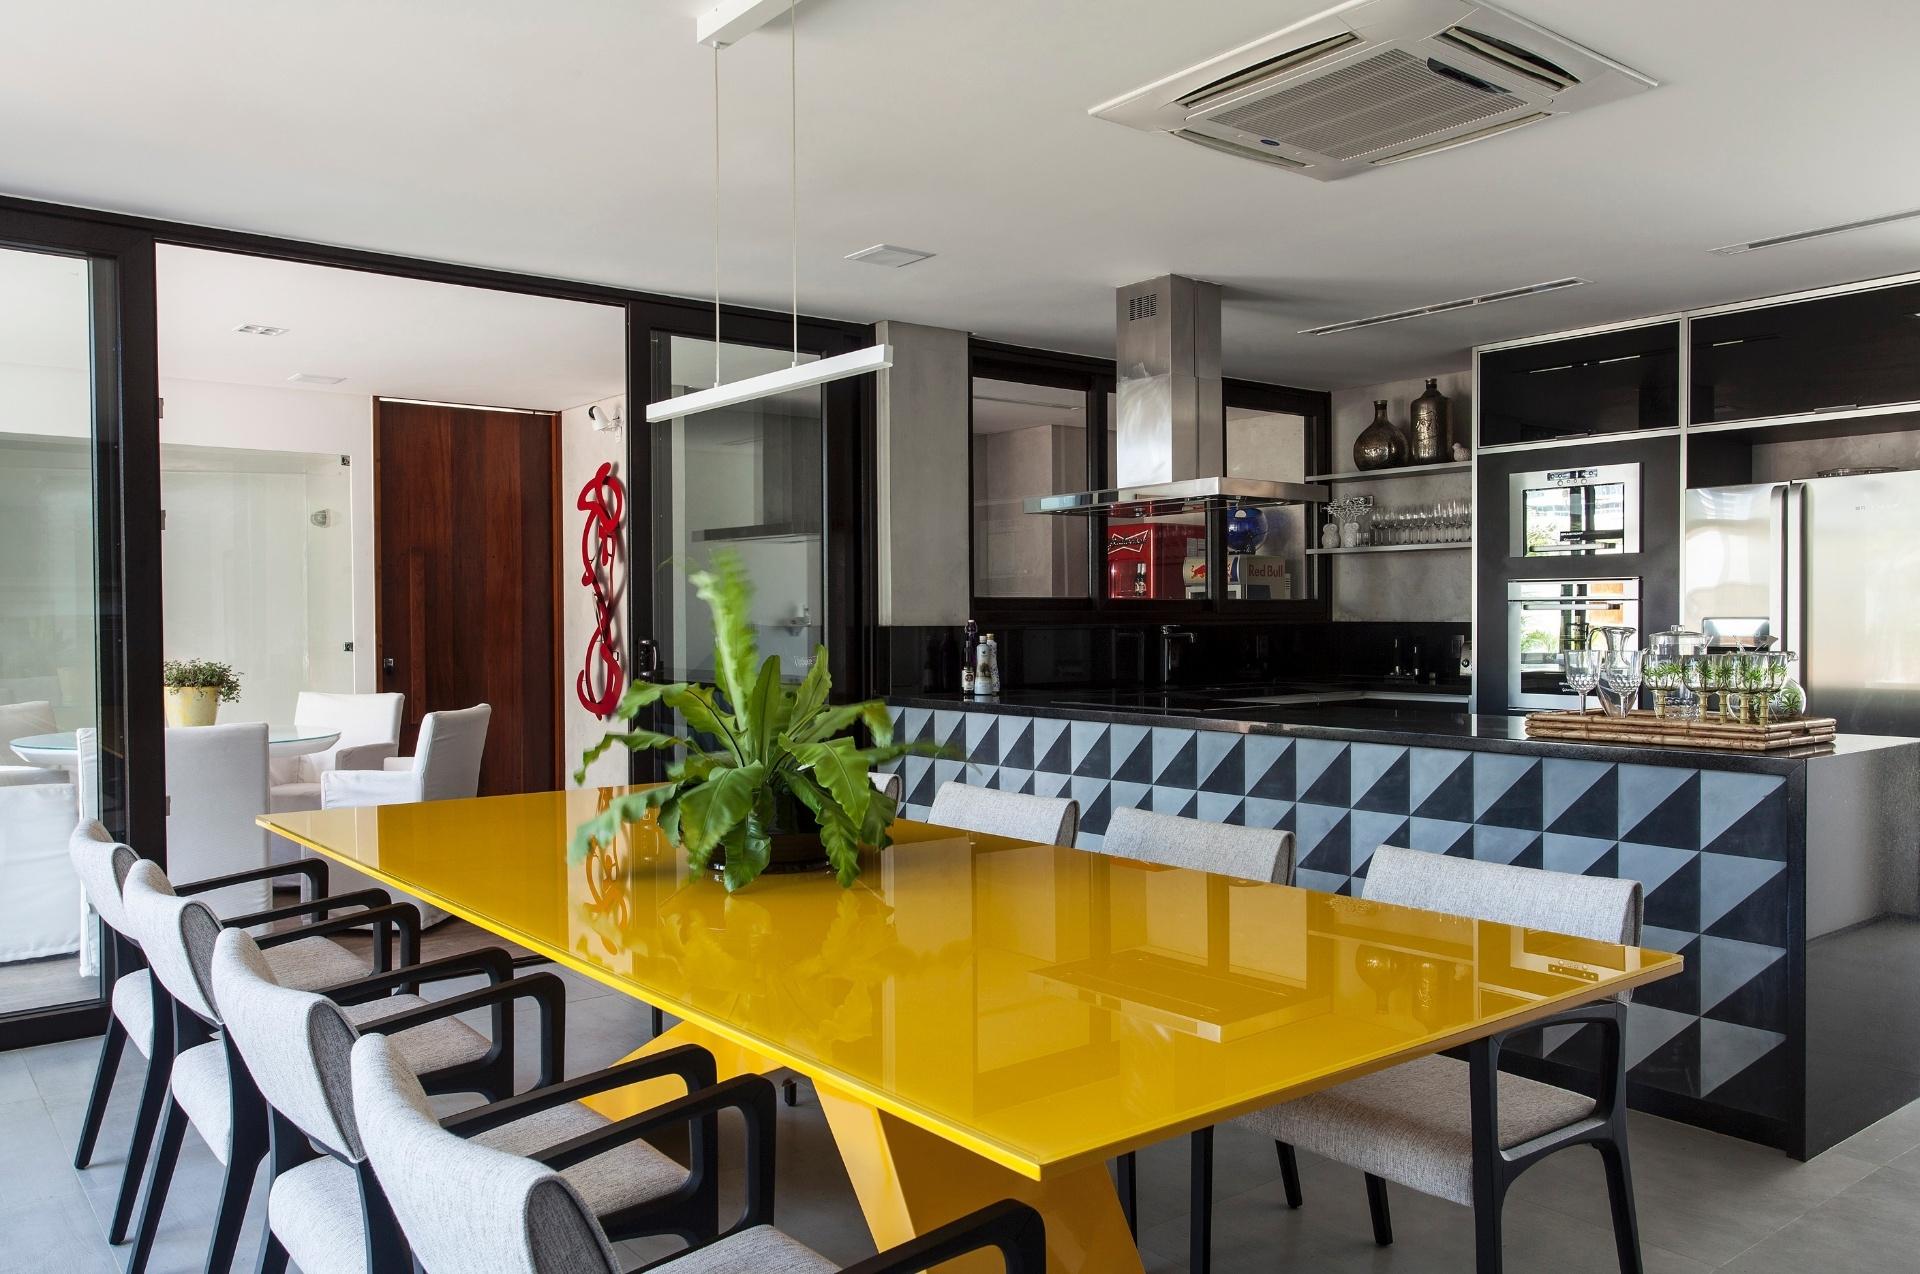 Salas de jantar: ideias para decorar o ambiente BOL Fotos BOL  #BF900C 1920 1274